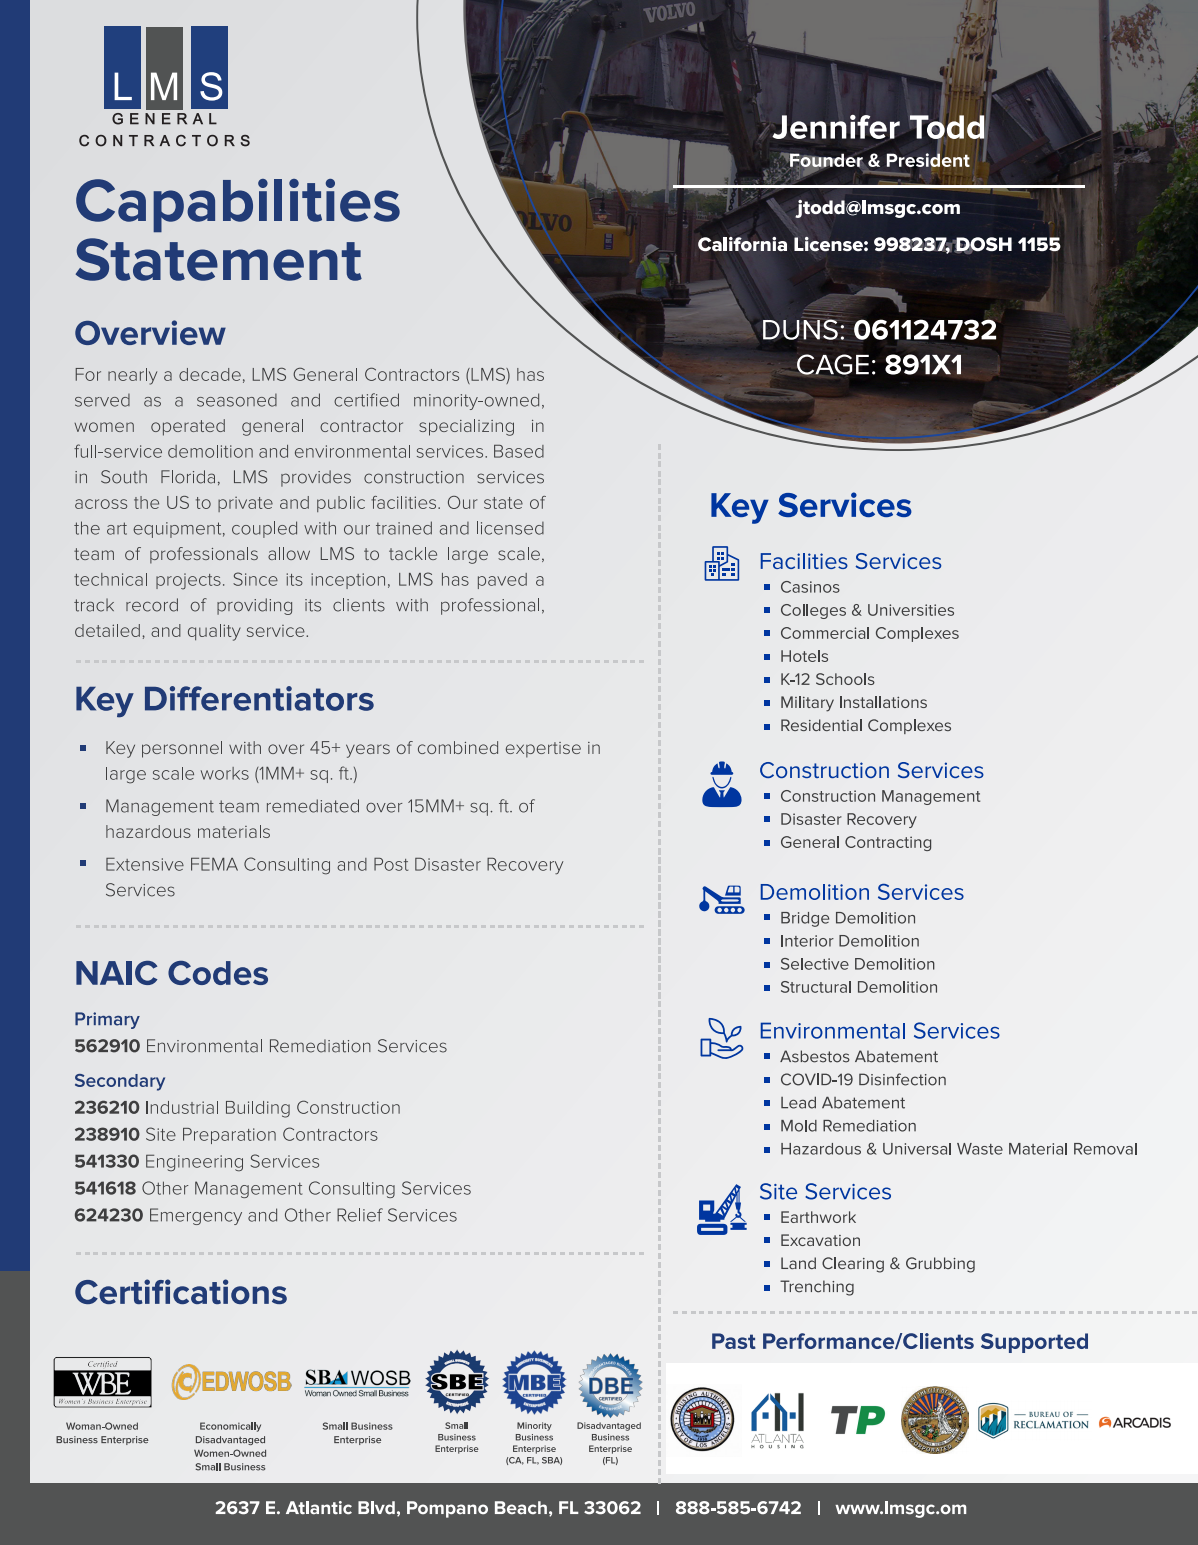 Capabilities Statment